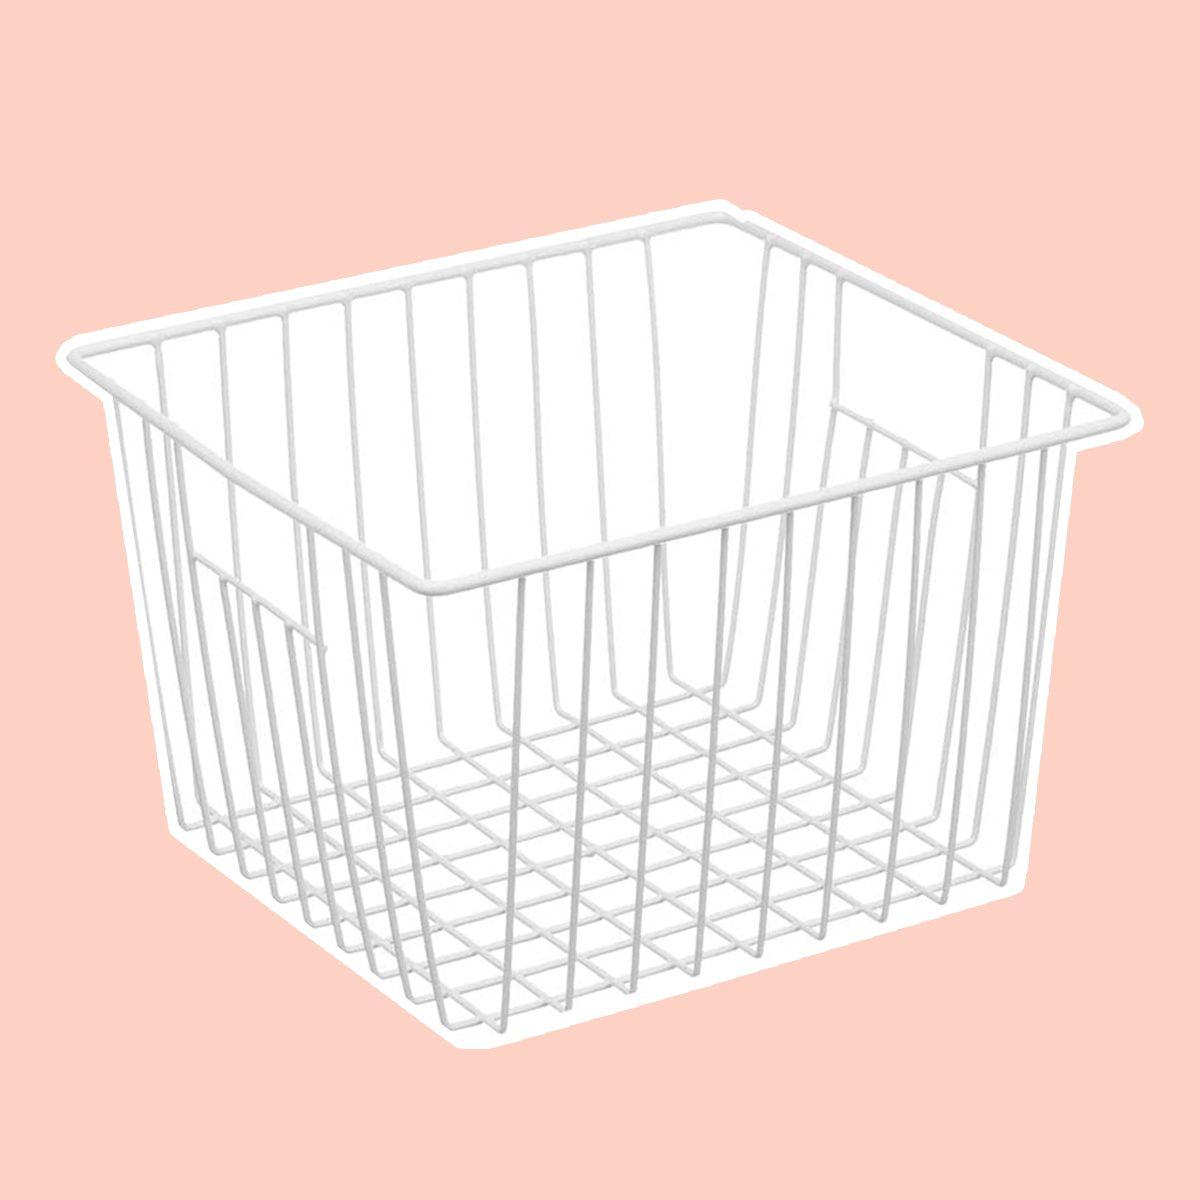 iPEGTOP Deep Refrigerator Freezer Baskets, Large Household Wire Storage Basket Bins Organizer with Handles for Kitchen, Pantry, Freezer, Cabinet, Closets